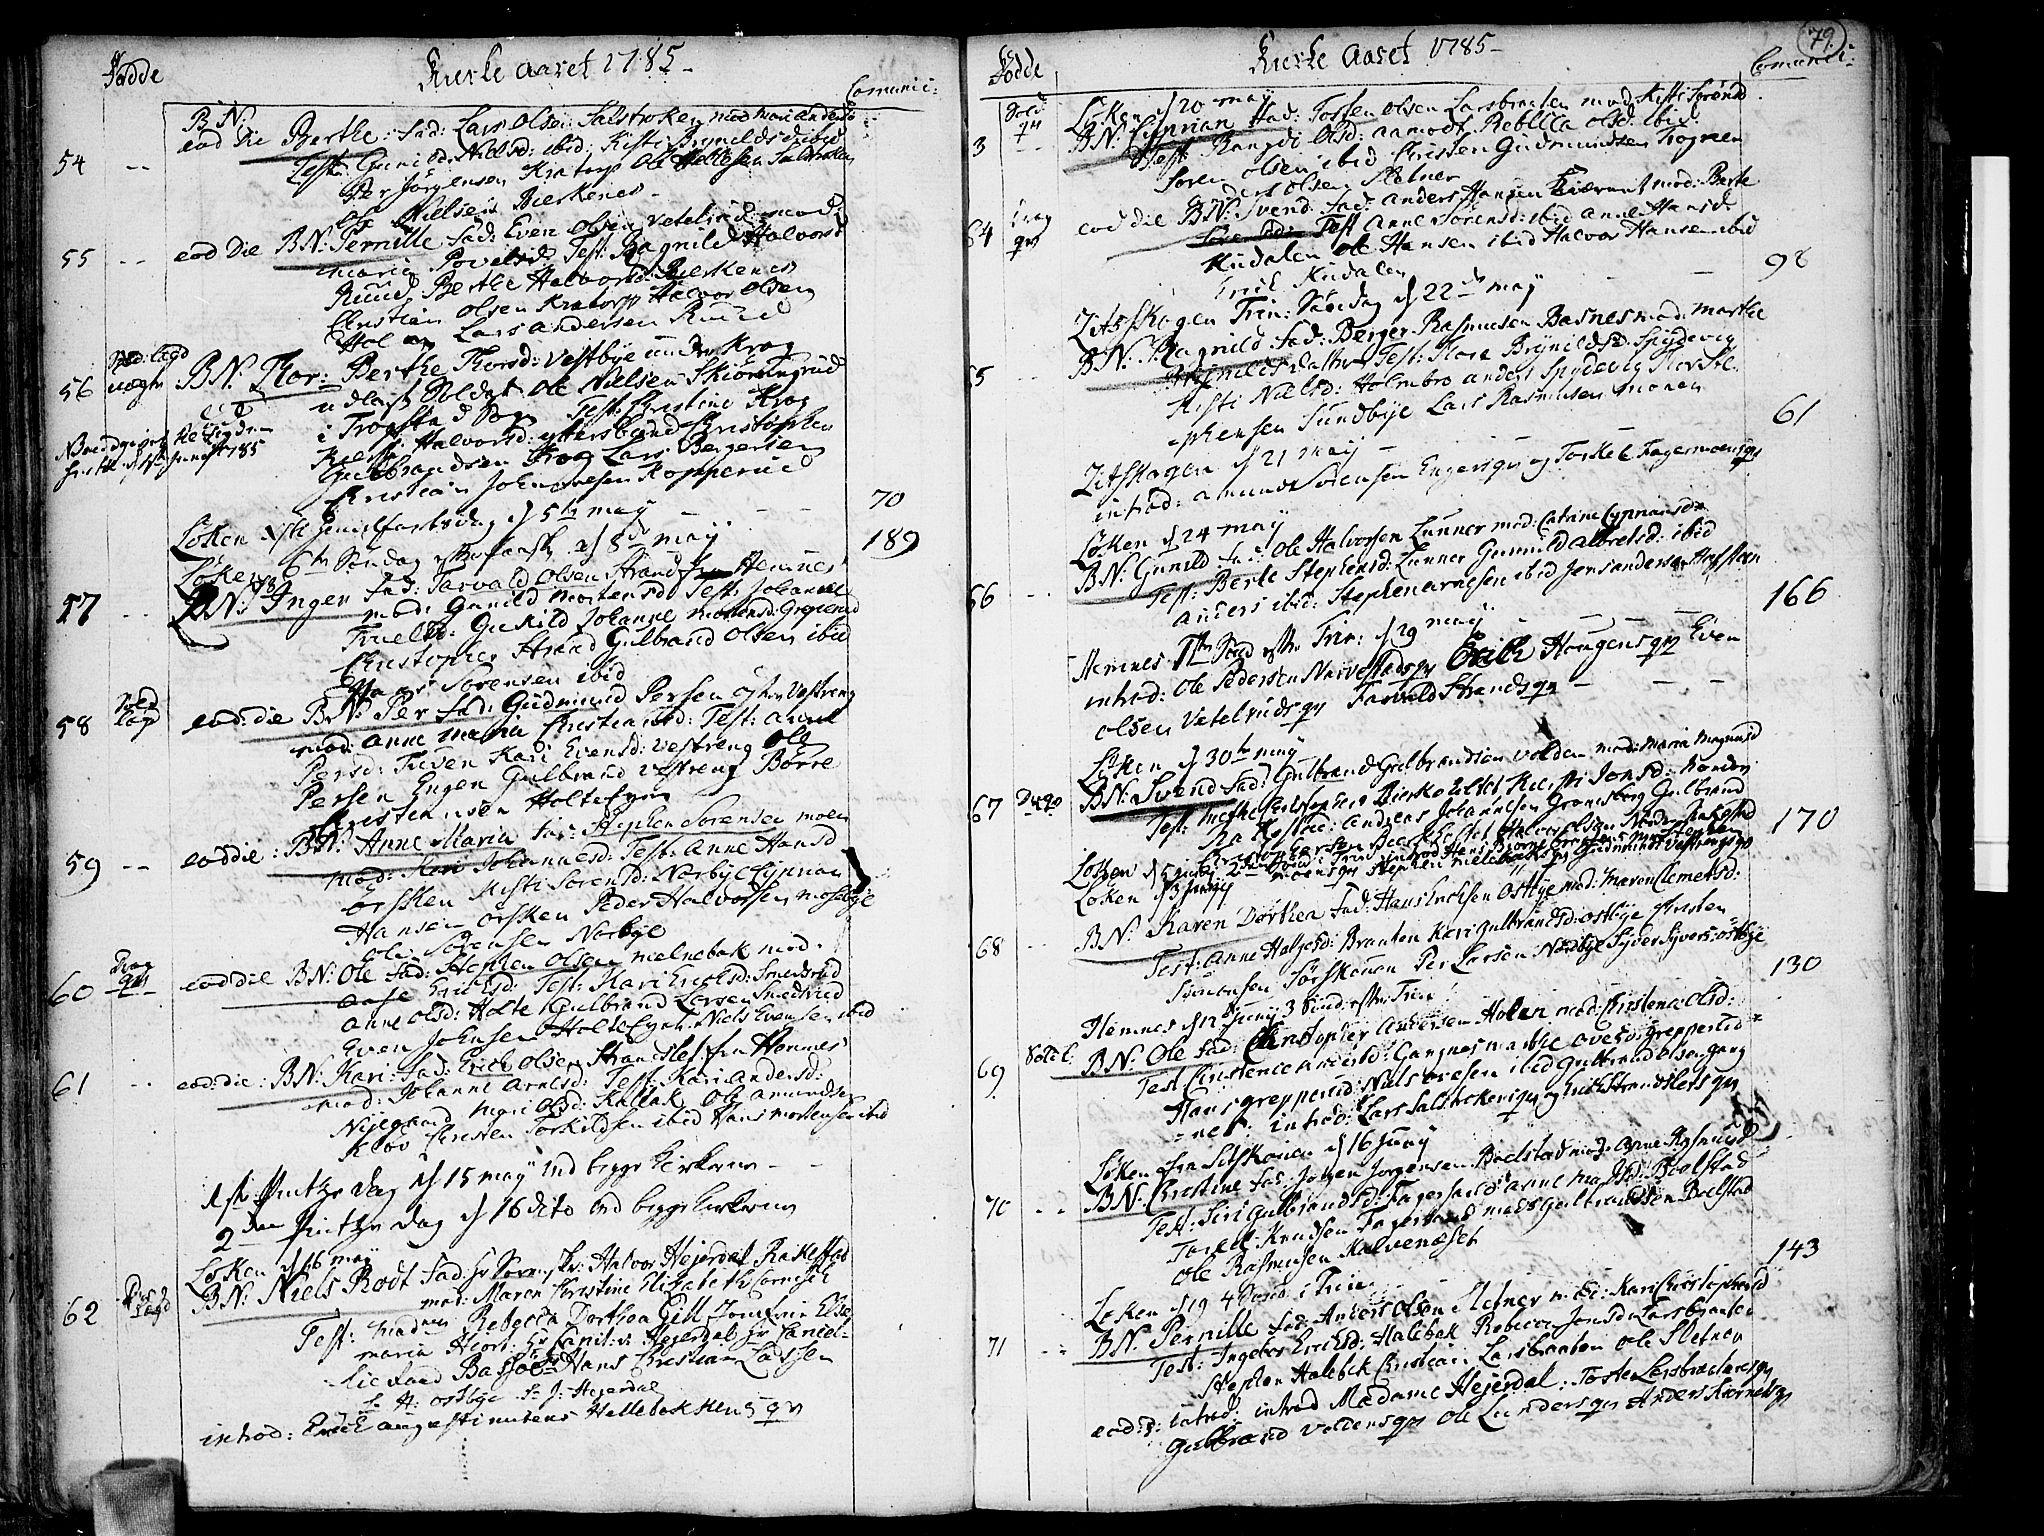 SAO, Høland prestekontor Kirkebøker, F/Fa/L0005: Ministerialbok nr. I 5, 1780-1793, s. 79